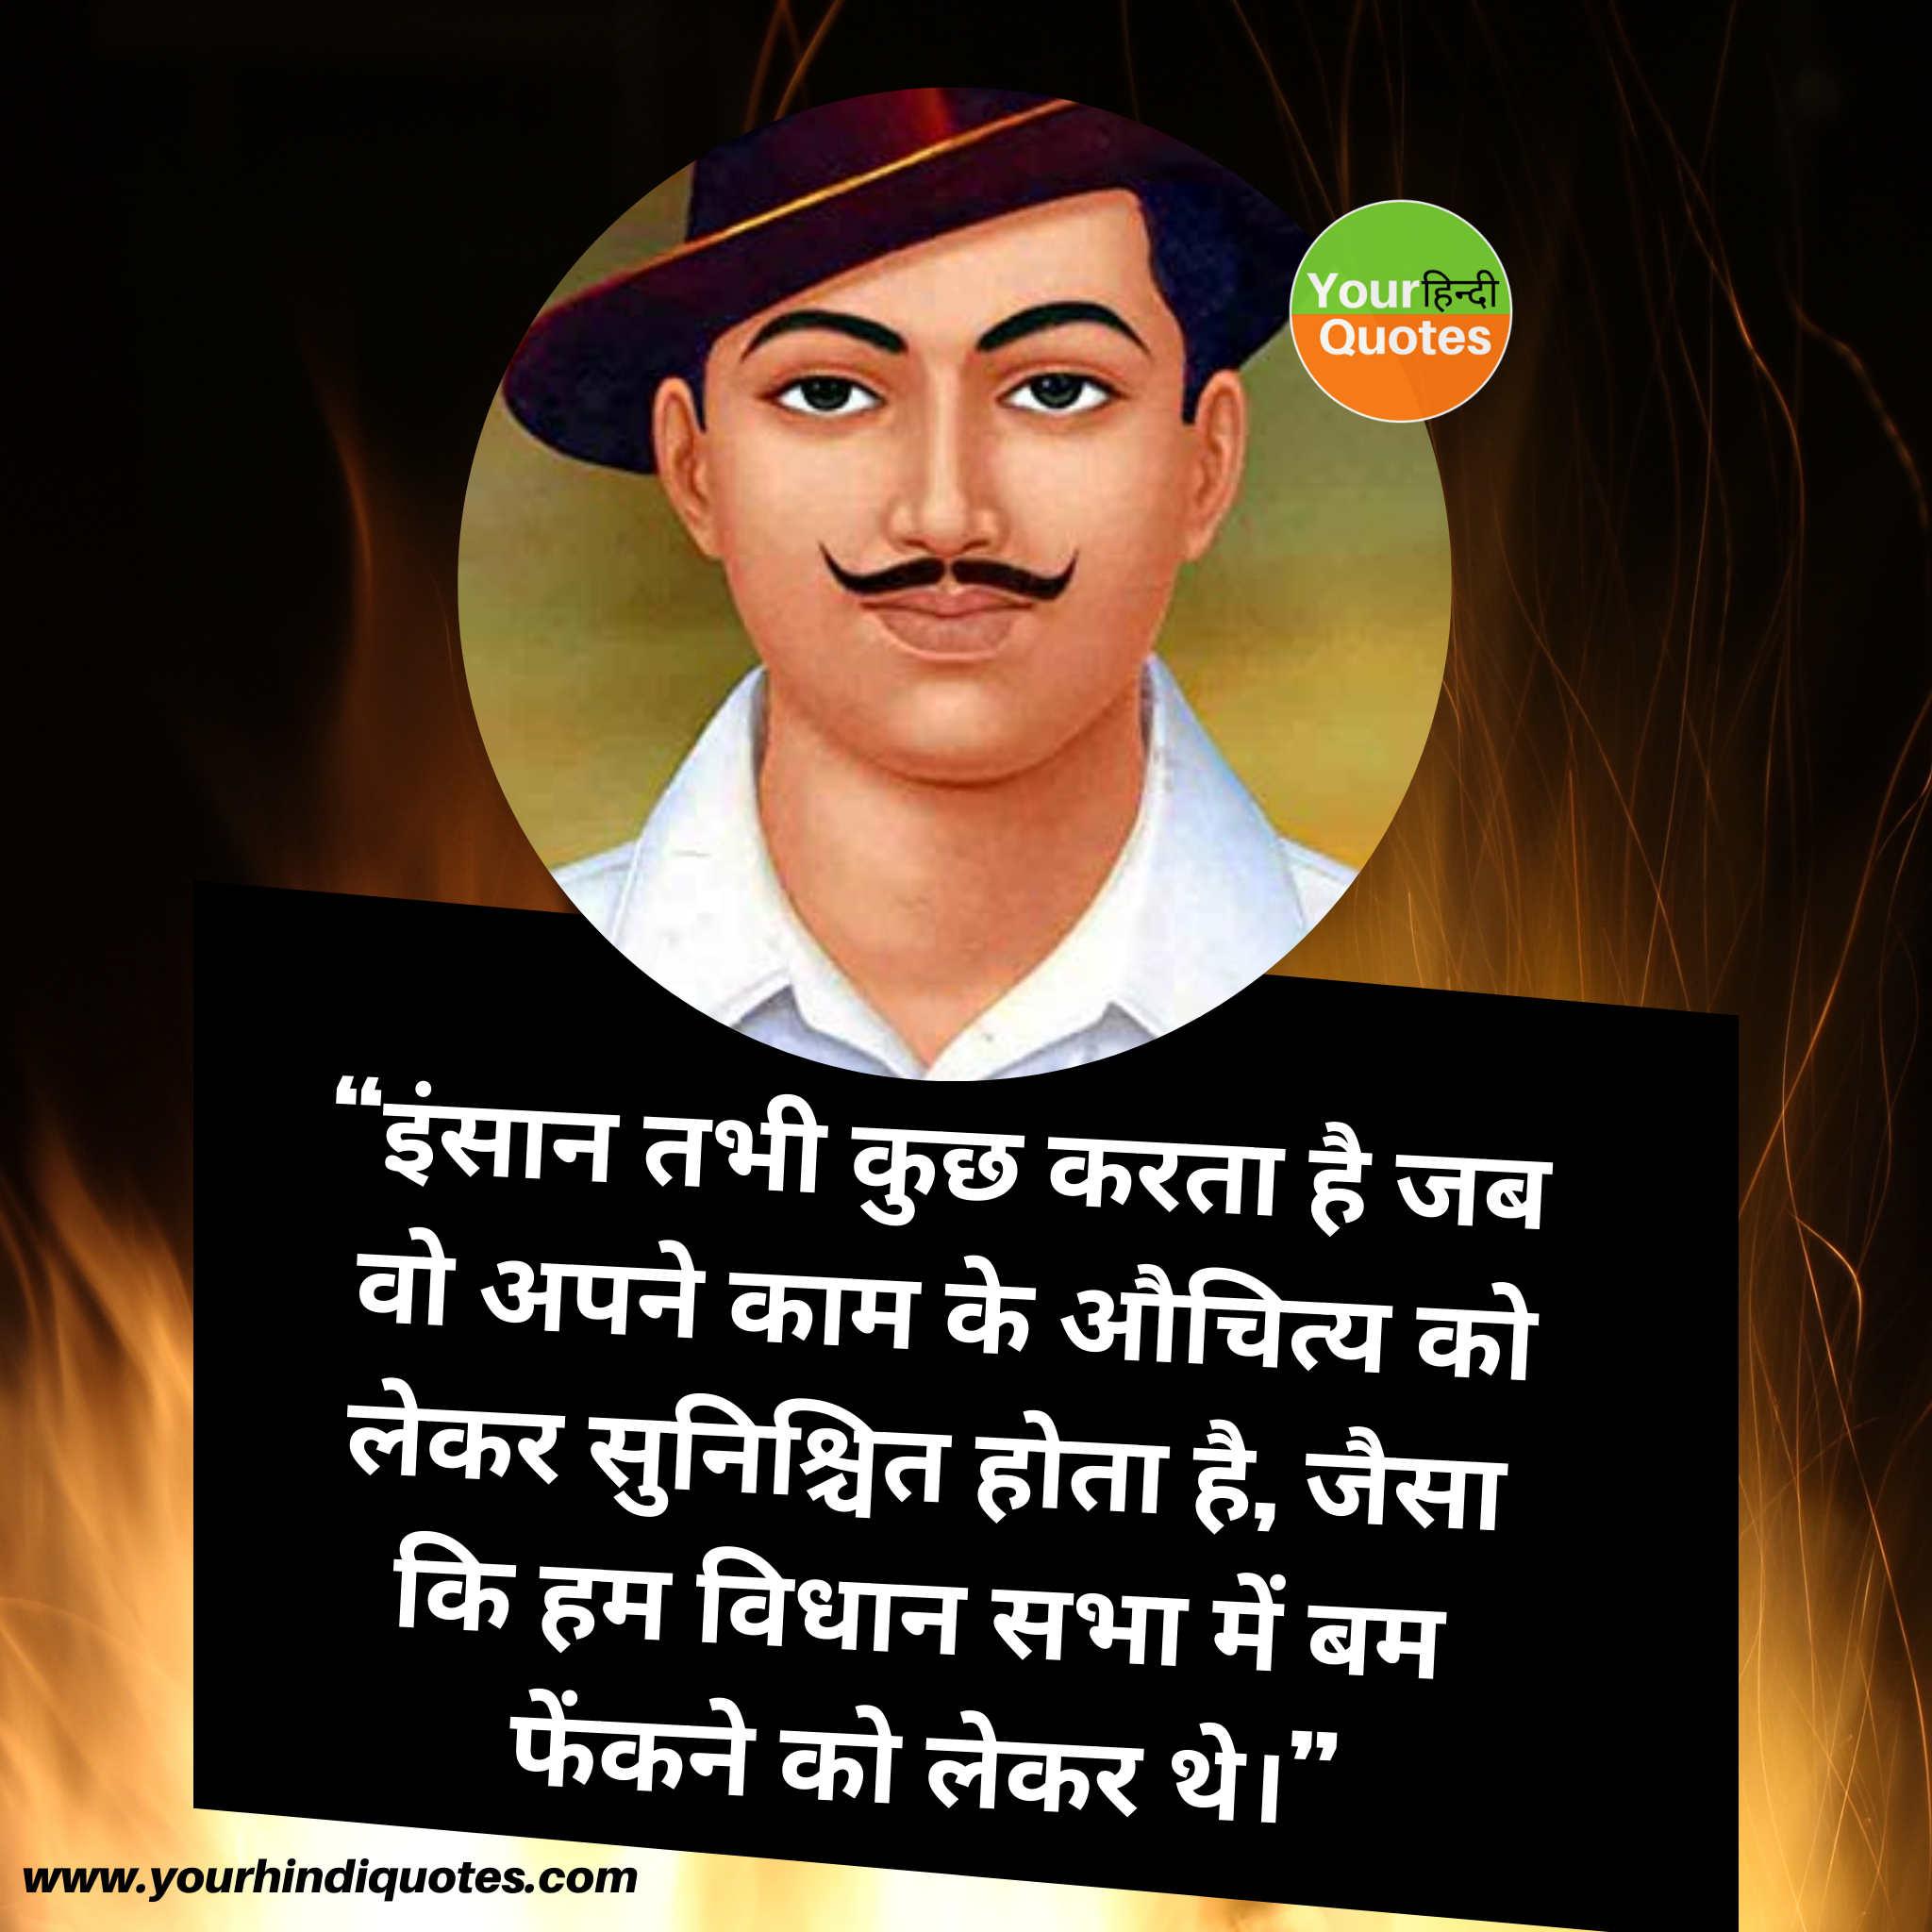 Hindi Bhagat Singh Quotes Image